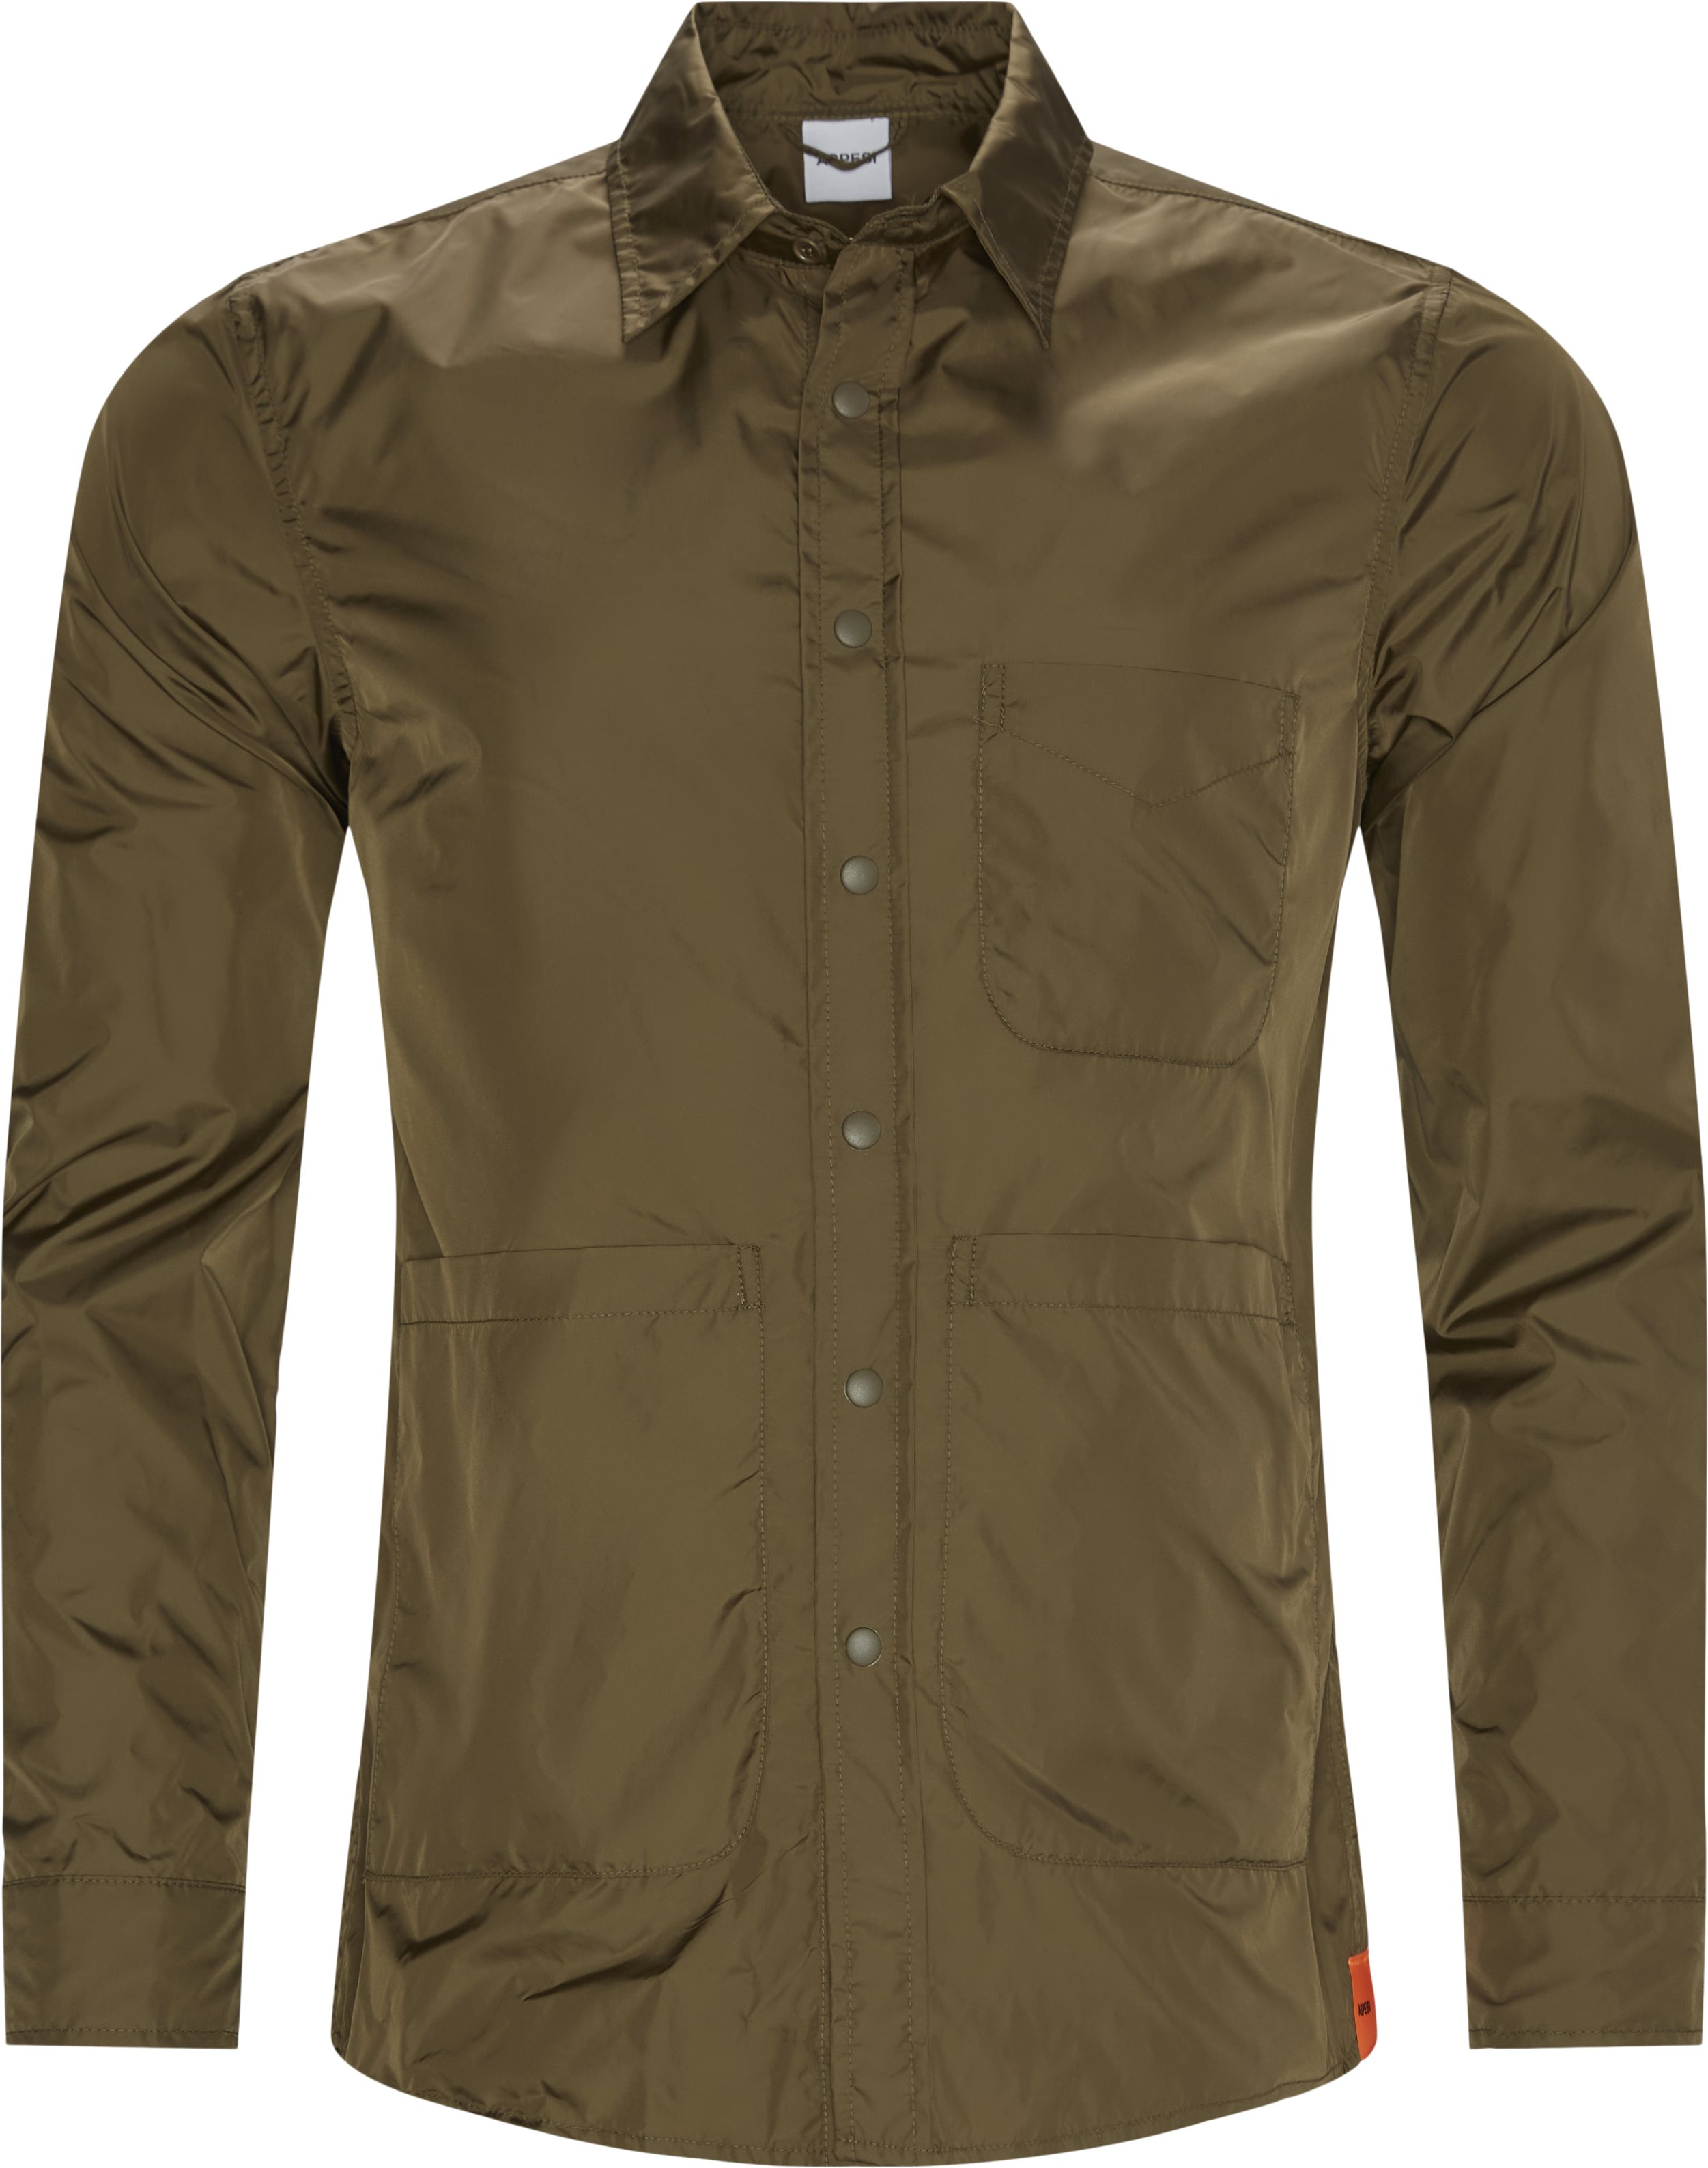 Nylon skjorte - Skjorter - Regular fit - Army